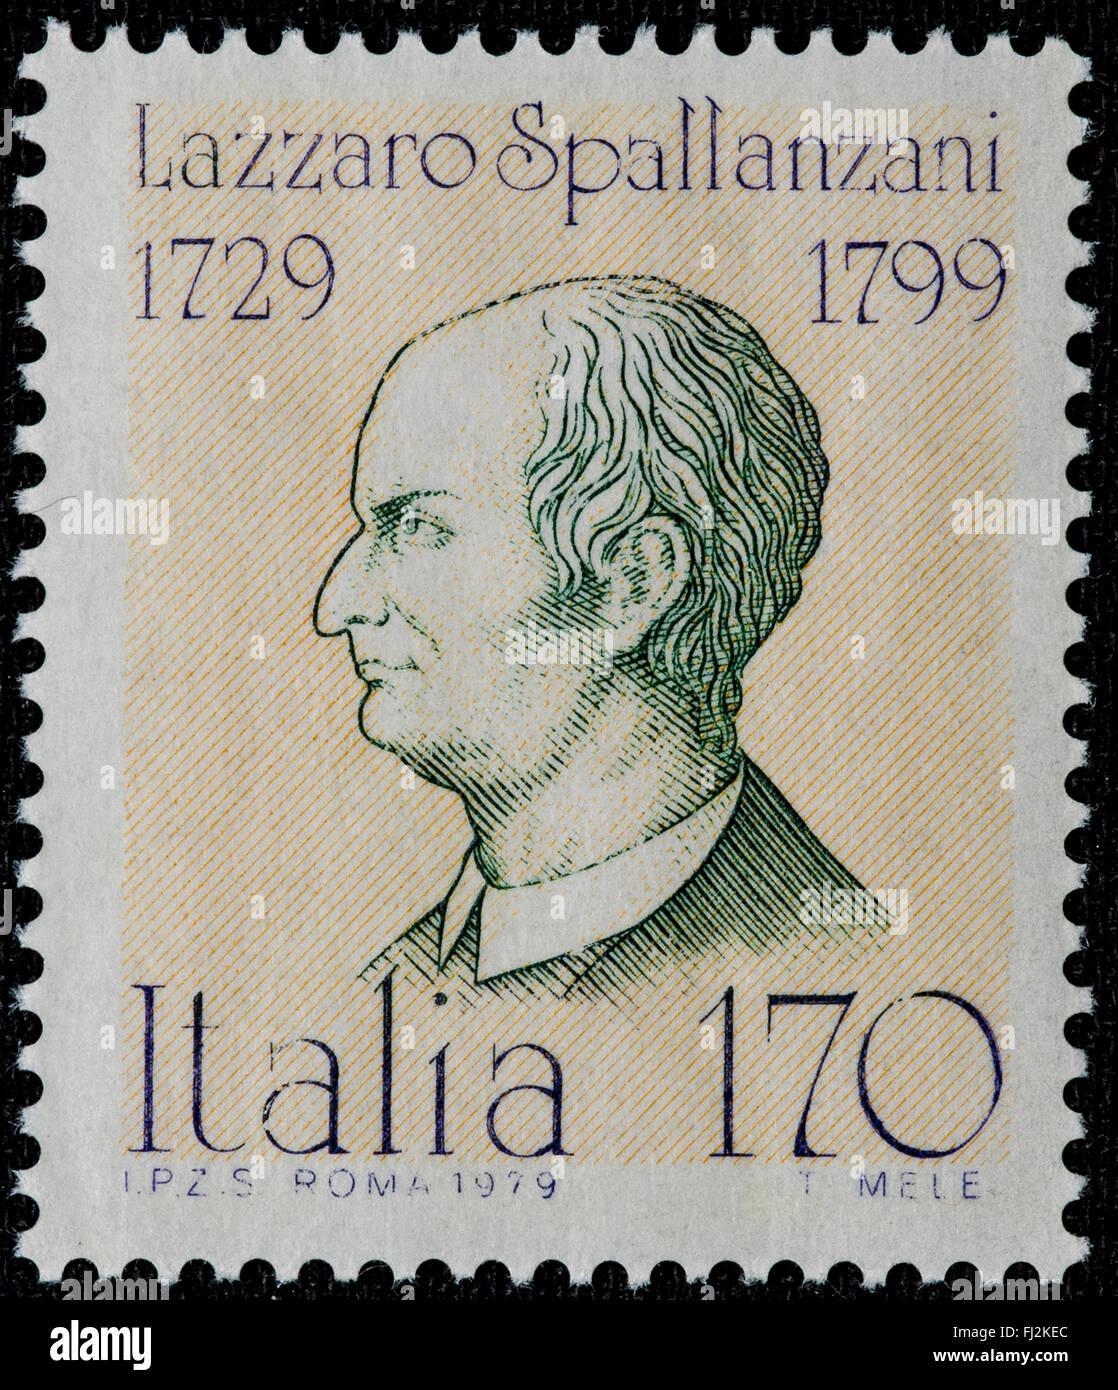 1979 - Italian mint stamp issued to celebrate Lazzaro Spallanzani Lire 170 Stock Photo